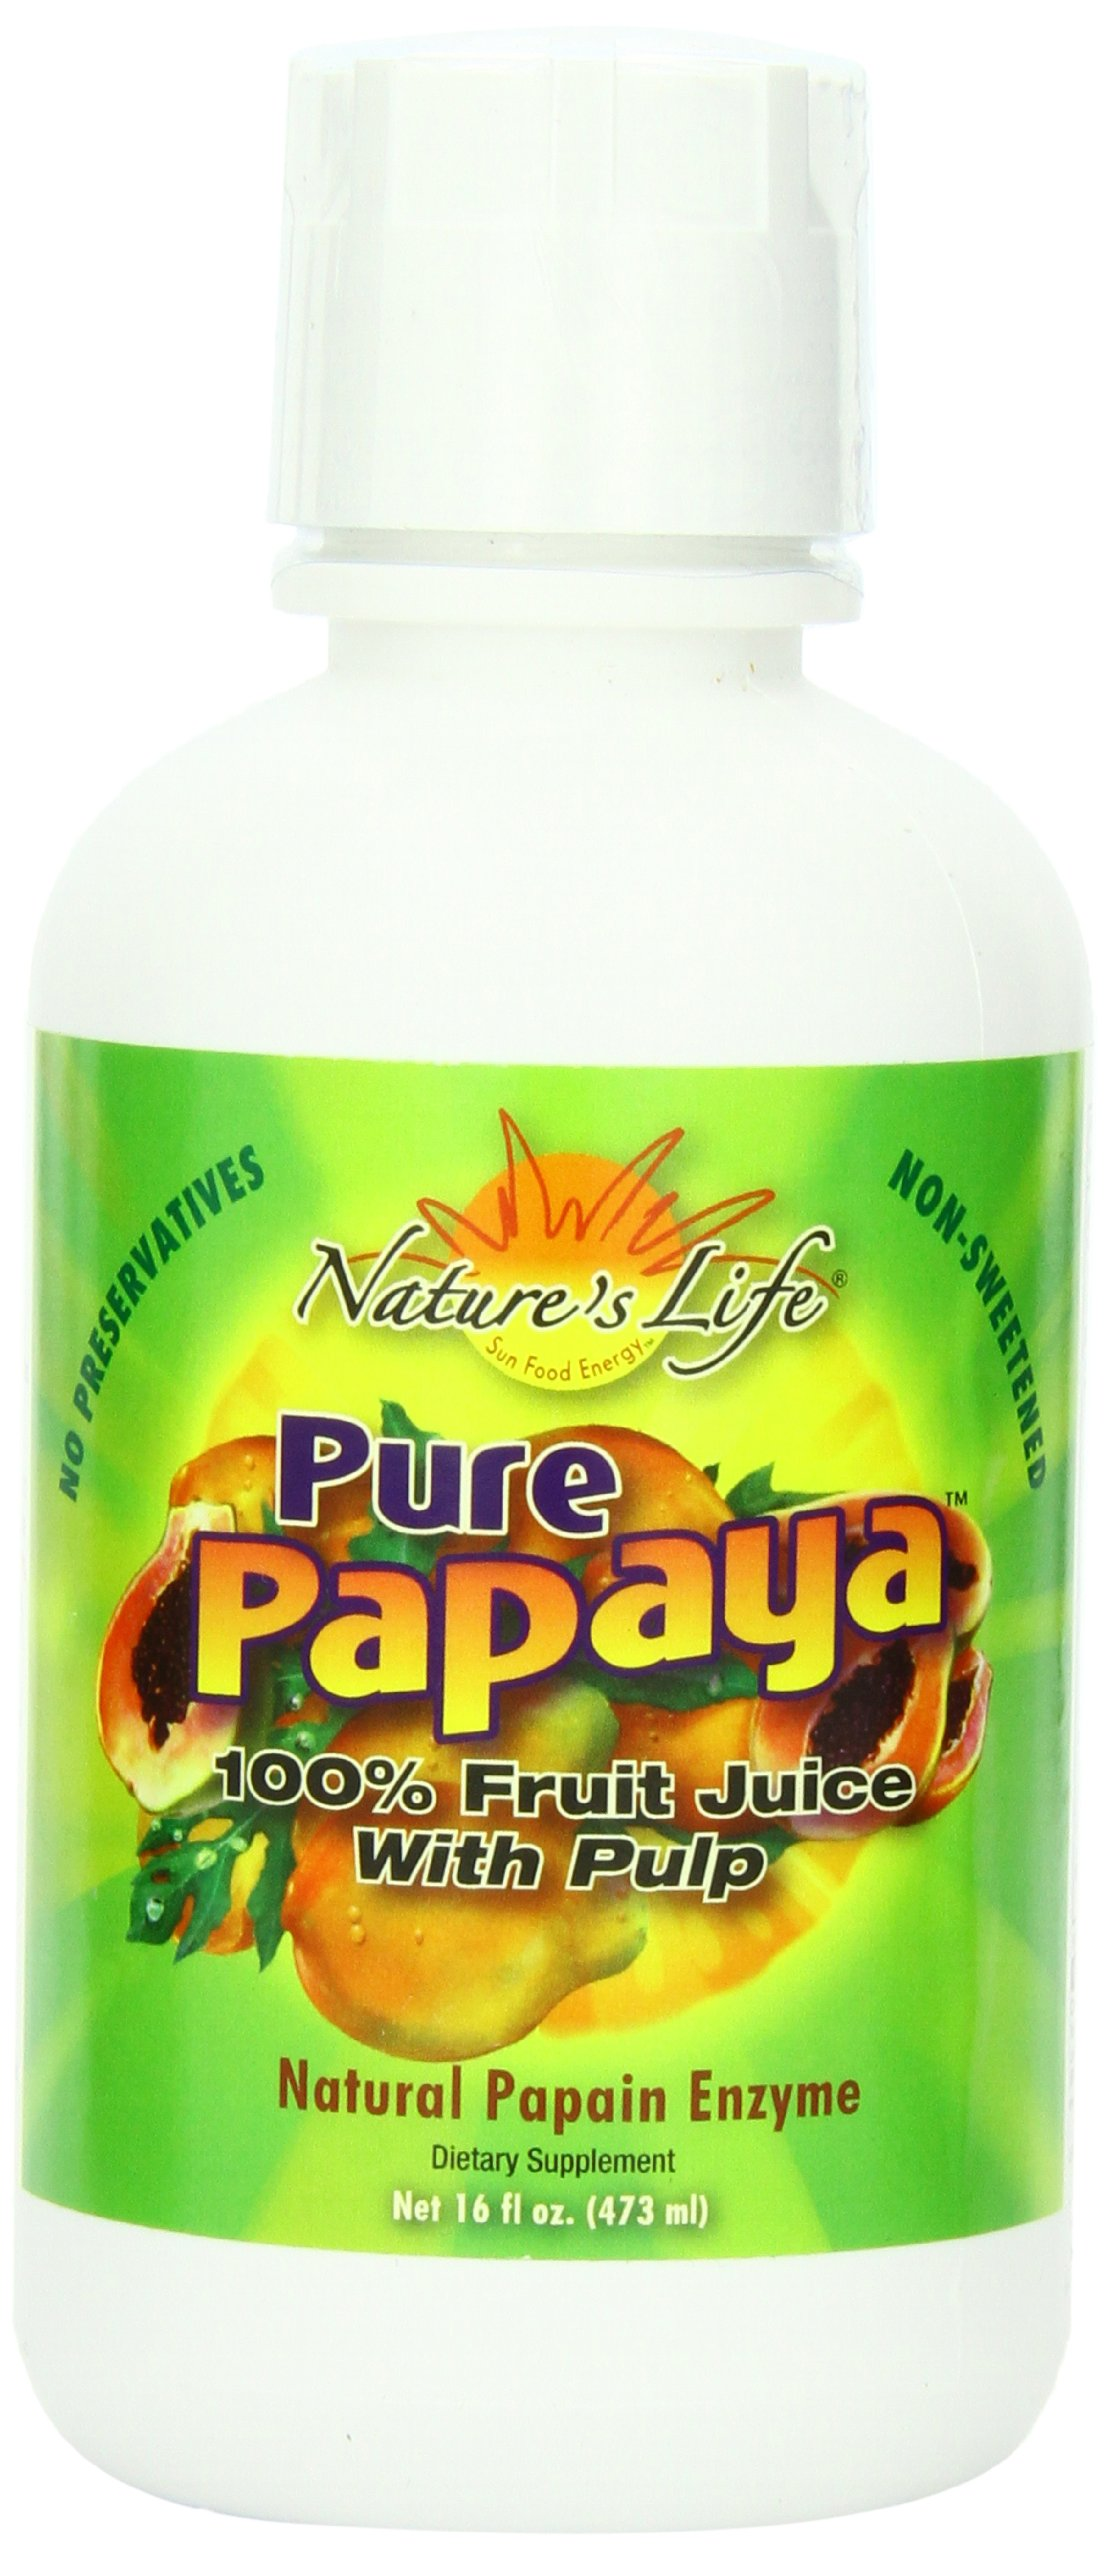 Nature's Life Pure Papaya with Pulp, Natural, 16 Ounce